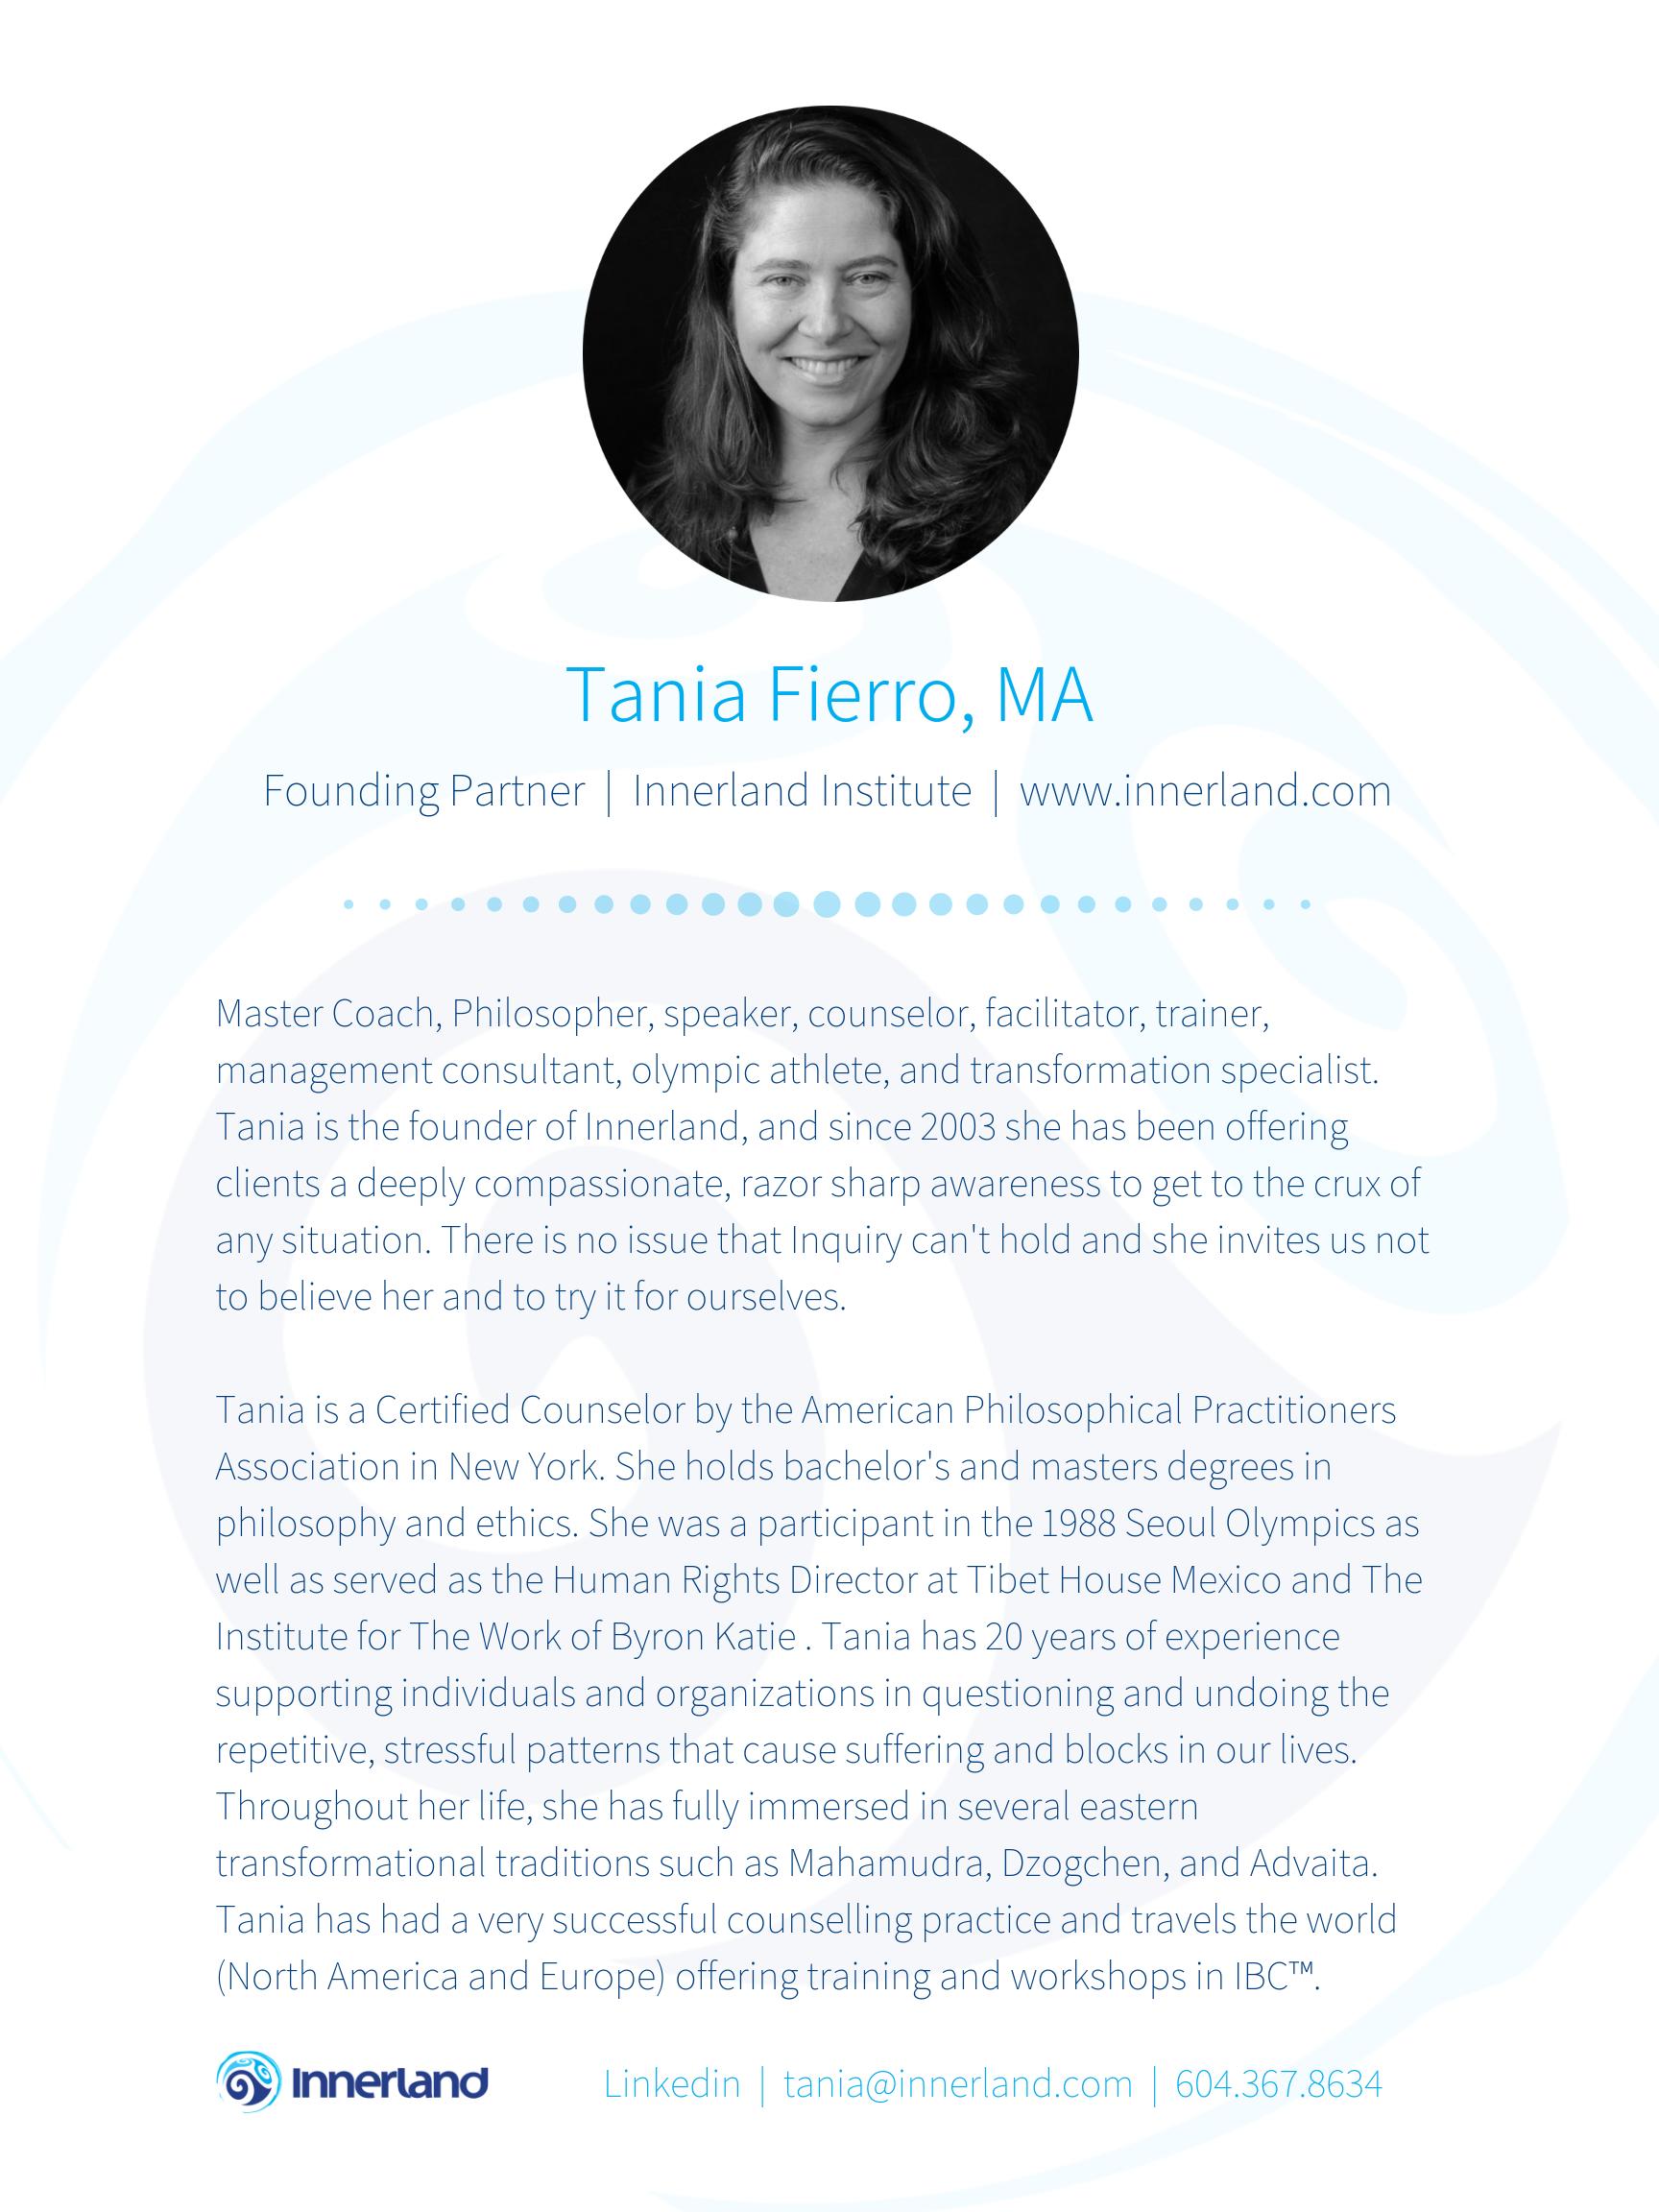 Tania Fierro, MA BIO (1) copy.png